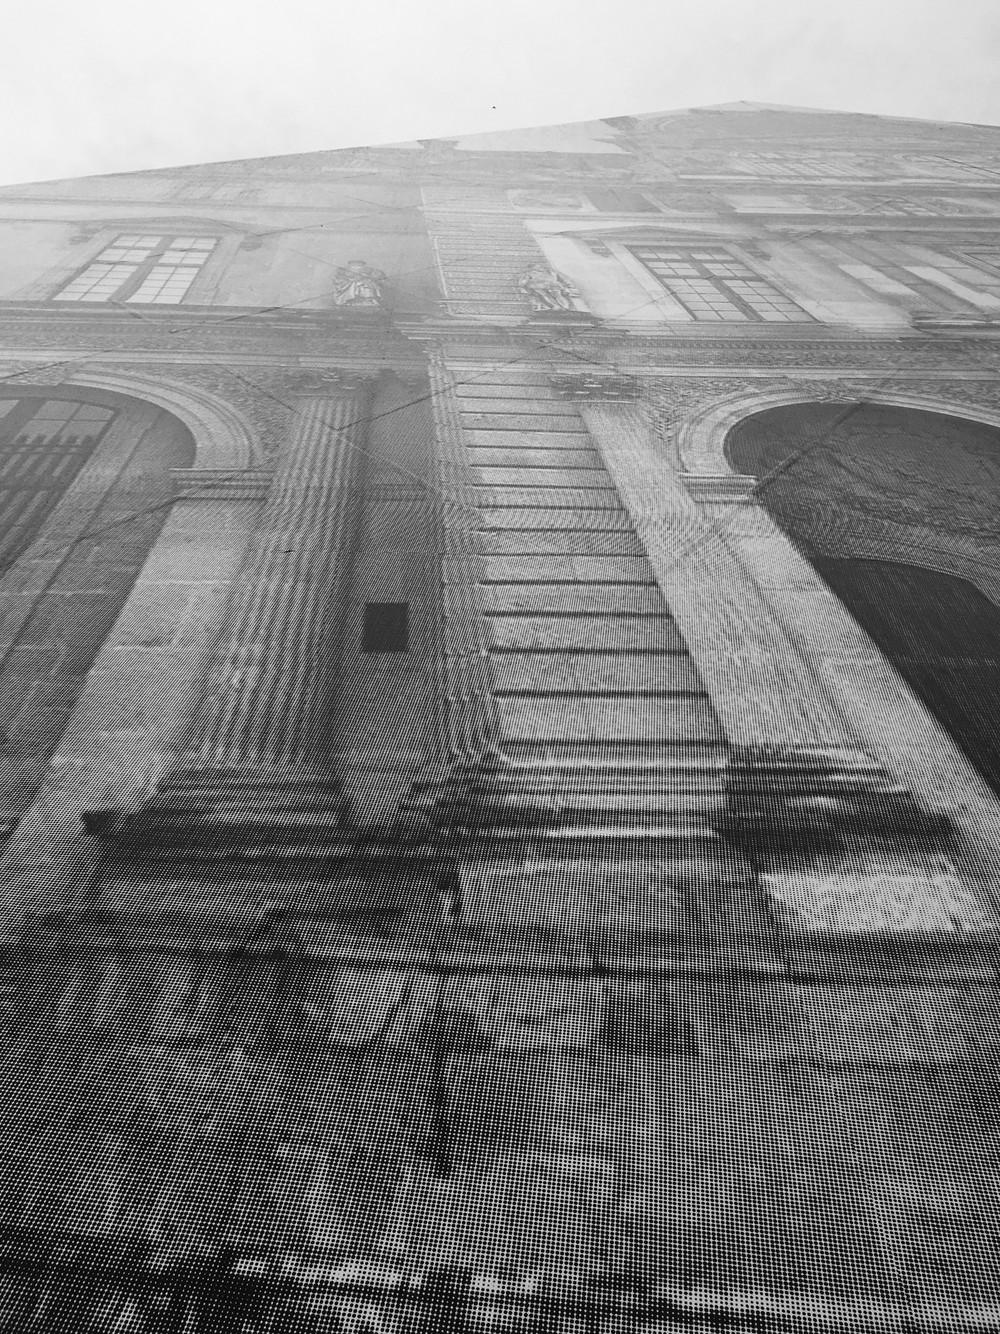 jr-artiste-contemporain-art-photo-restaurarte-galerie-perrotin-paris-le-havre-decade-louvre-restauration-image.jpg